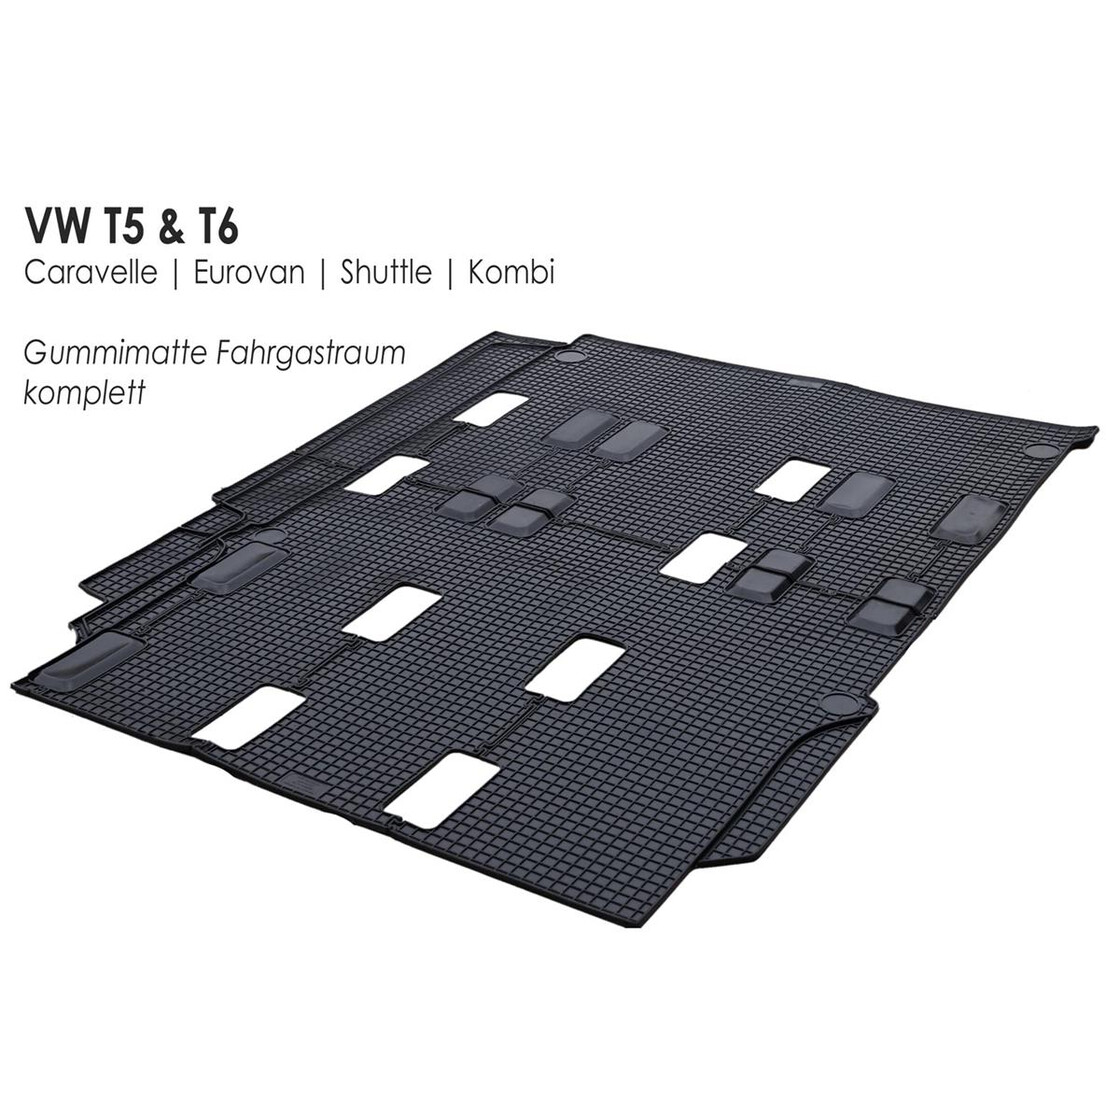 vw t5 t6 gummi fu matte fahrgastraum original kaufen. Black Bedroom Furniture Sets. Home Design Ideas